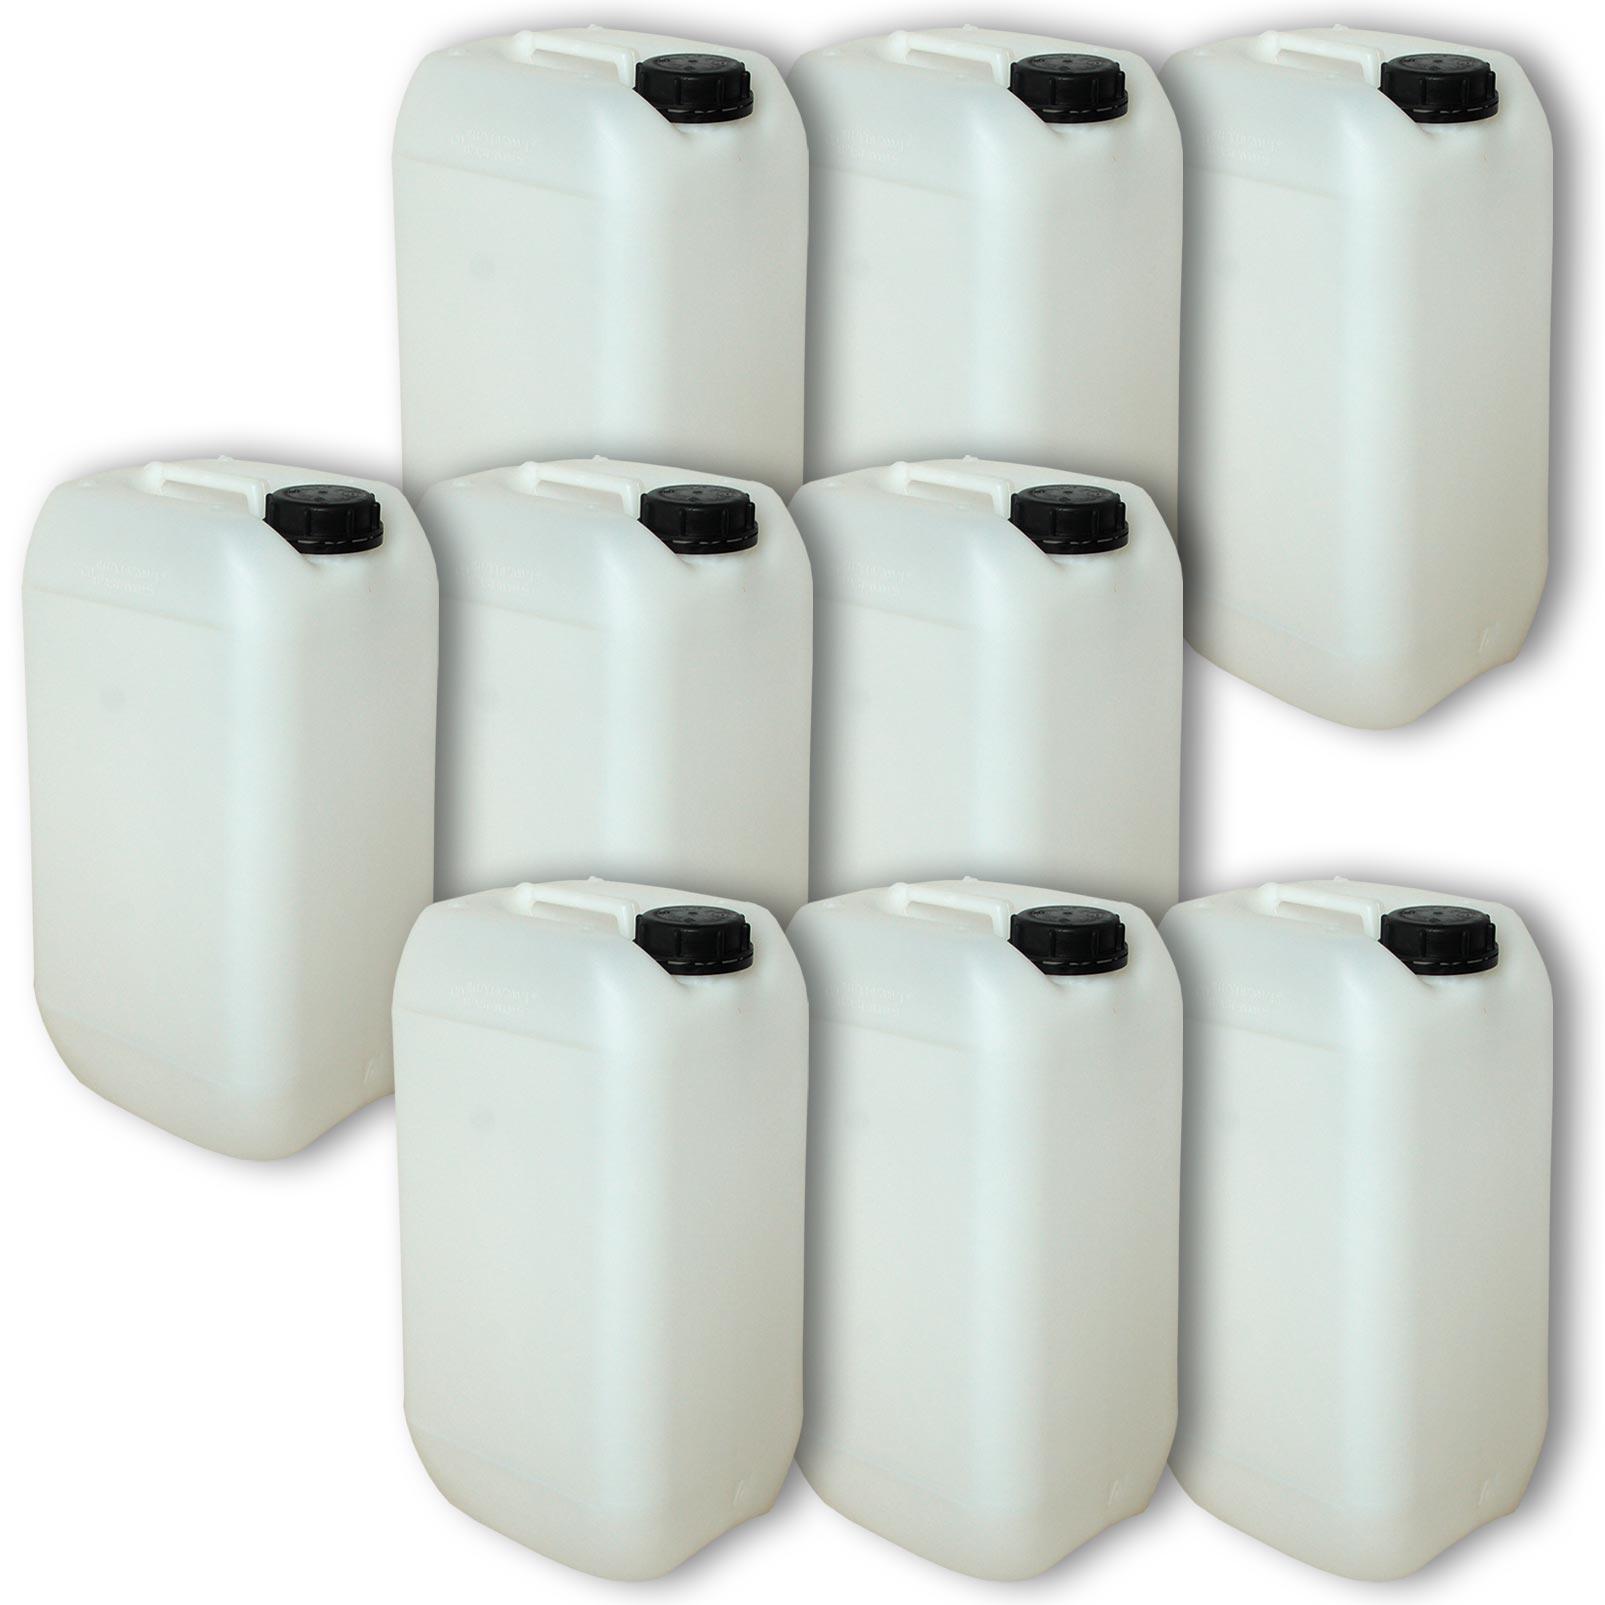 9-x-15-Liter-Wasserkanister-Camping-Getraenkekanister-Trinkwasser-9x22096